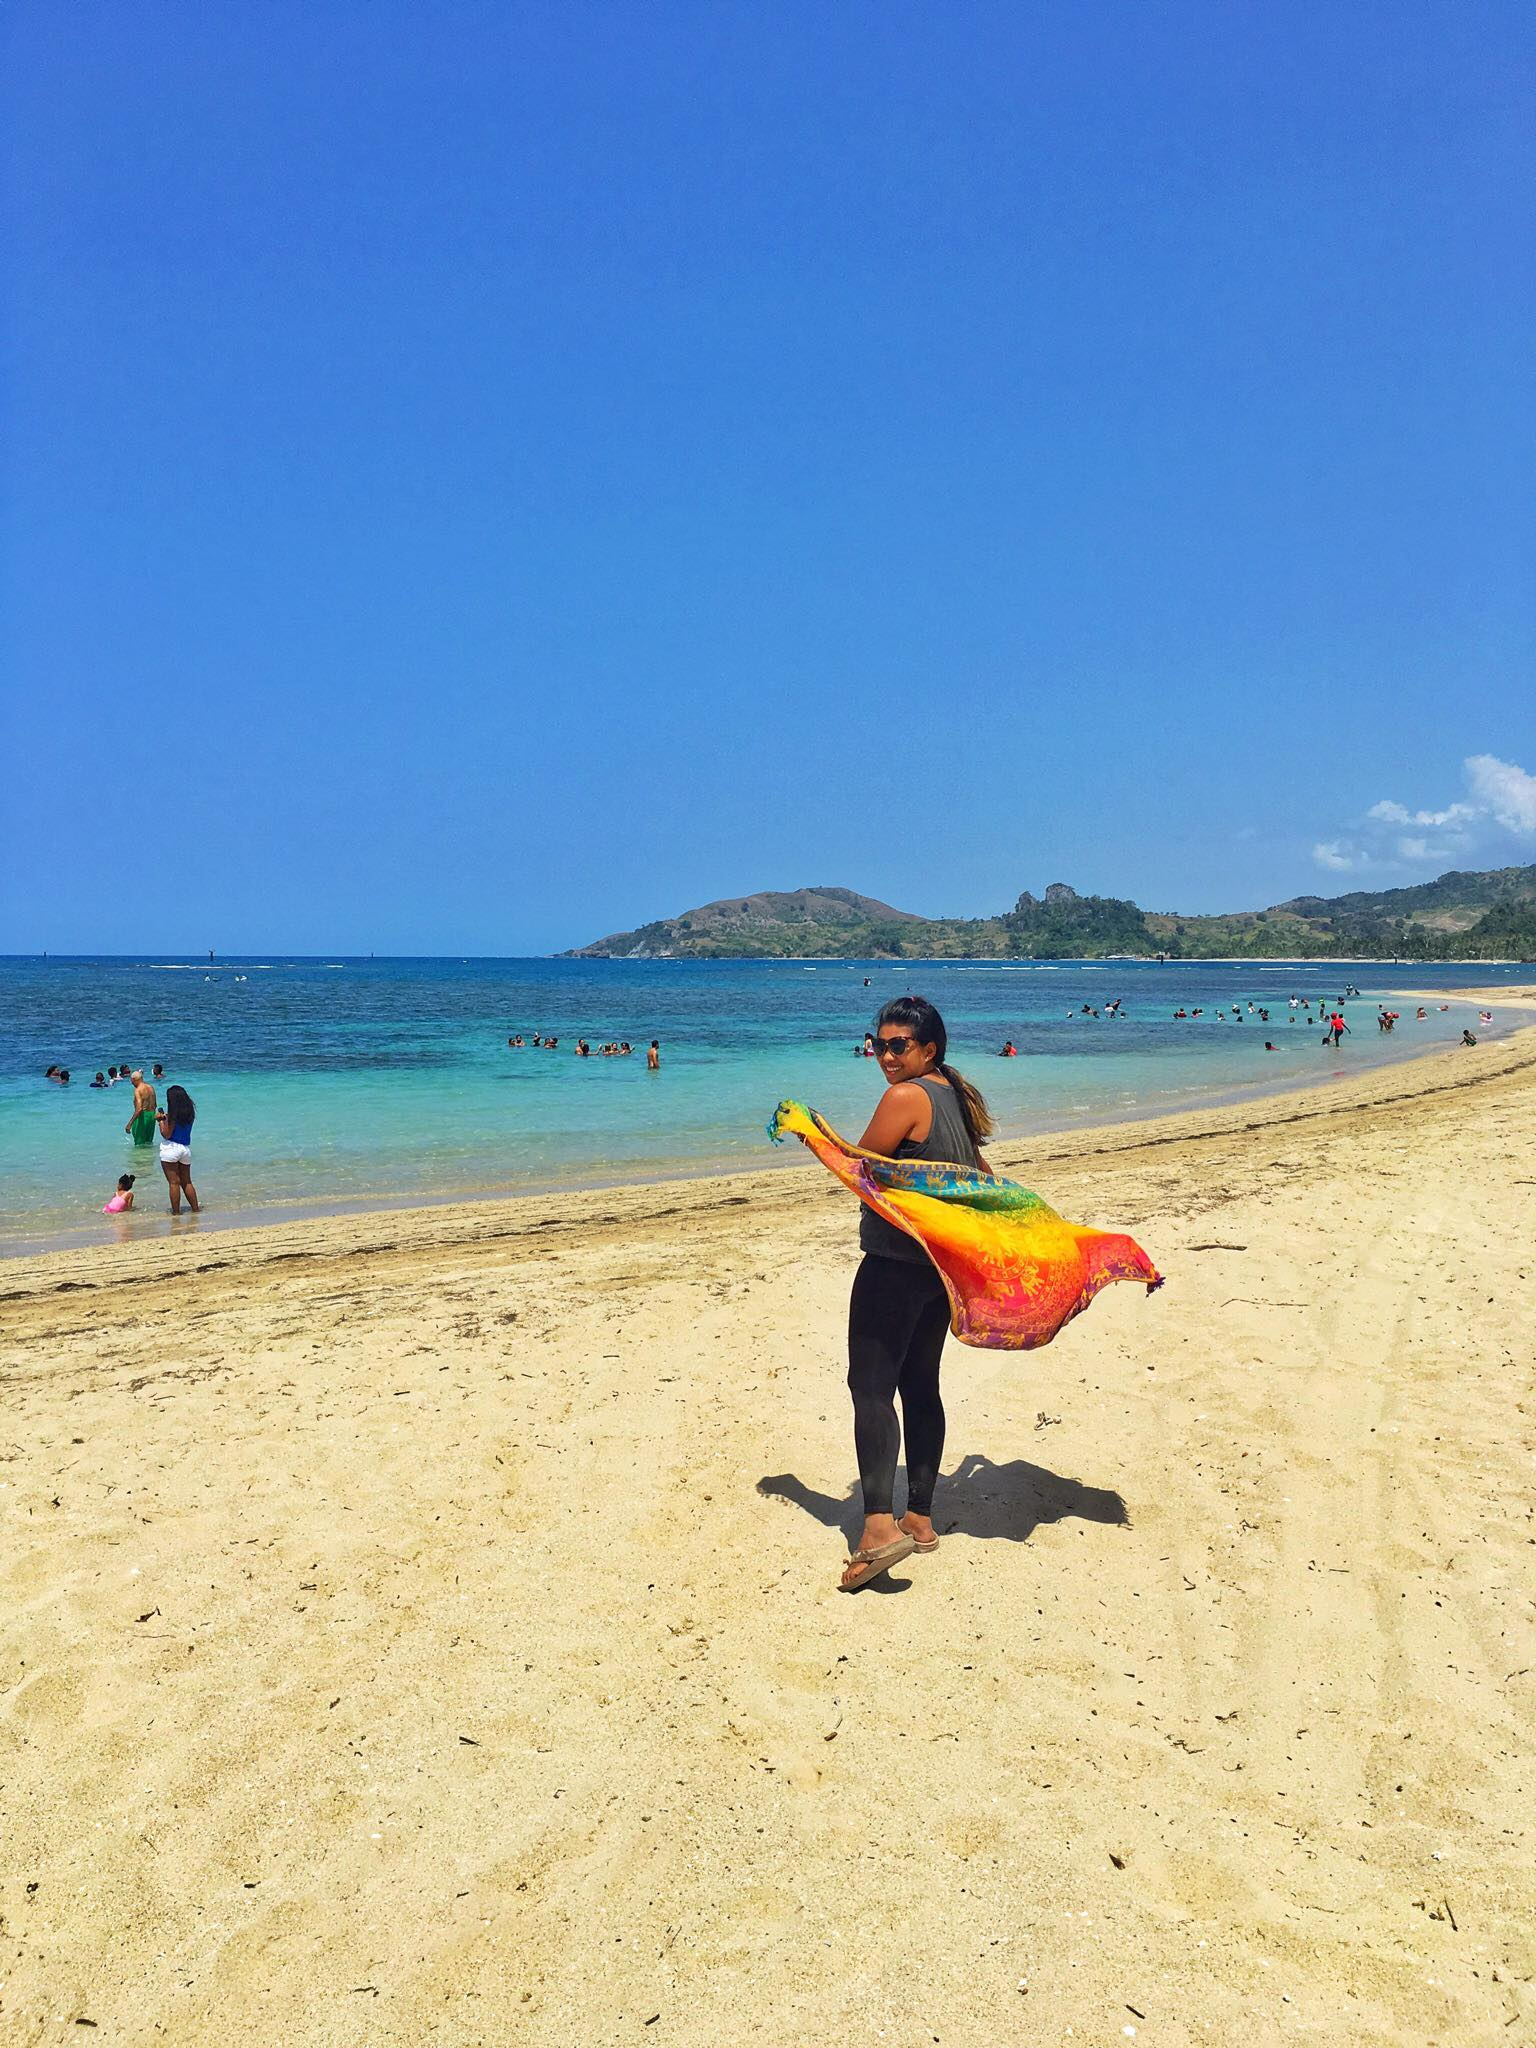 Liveaboard Life Day 114: Sunday Motorbike Trip to Playa Maimon, Puerto Playa